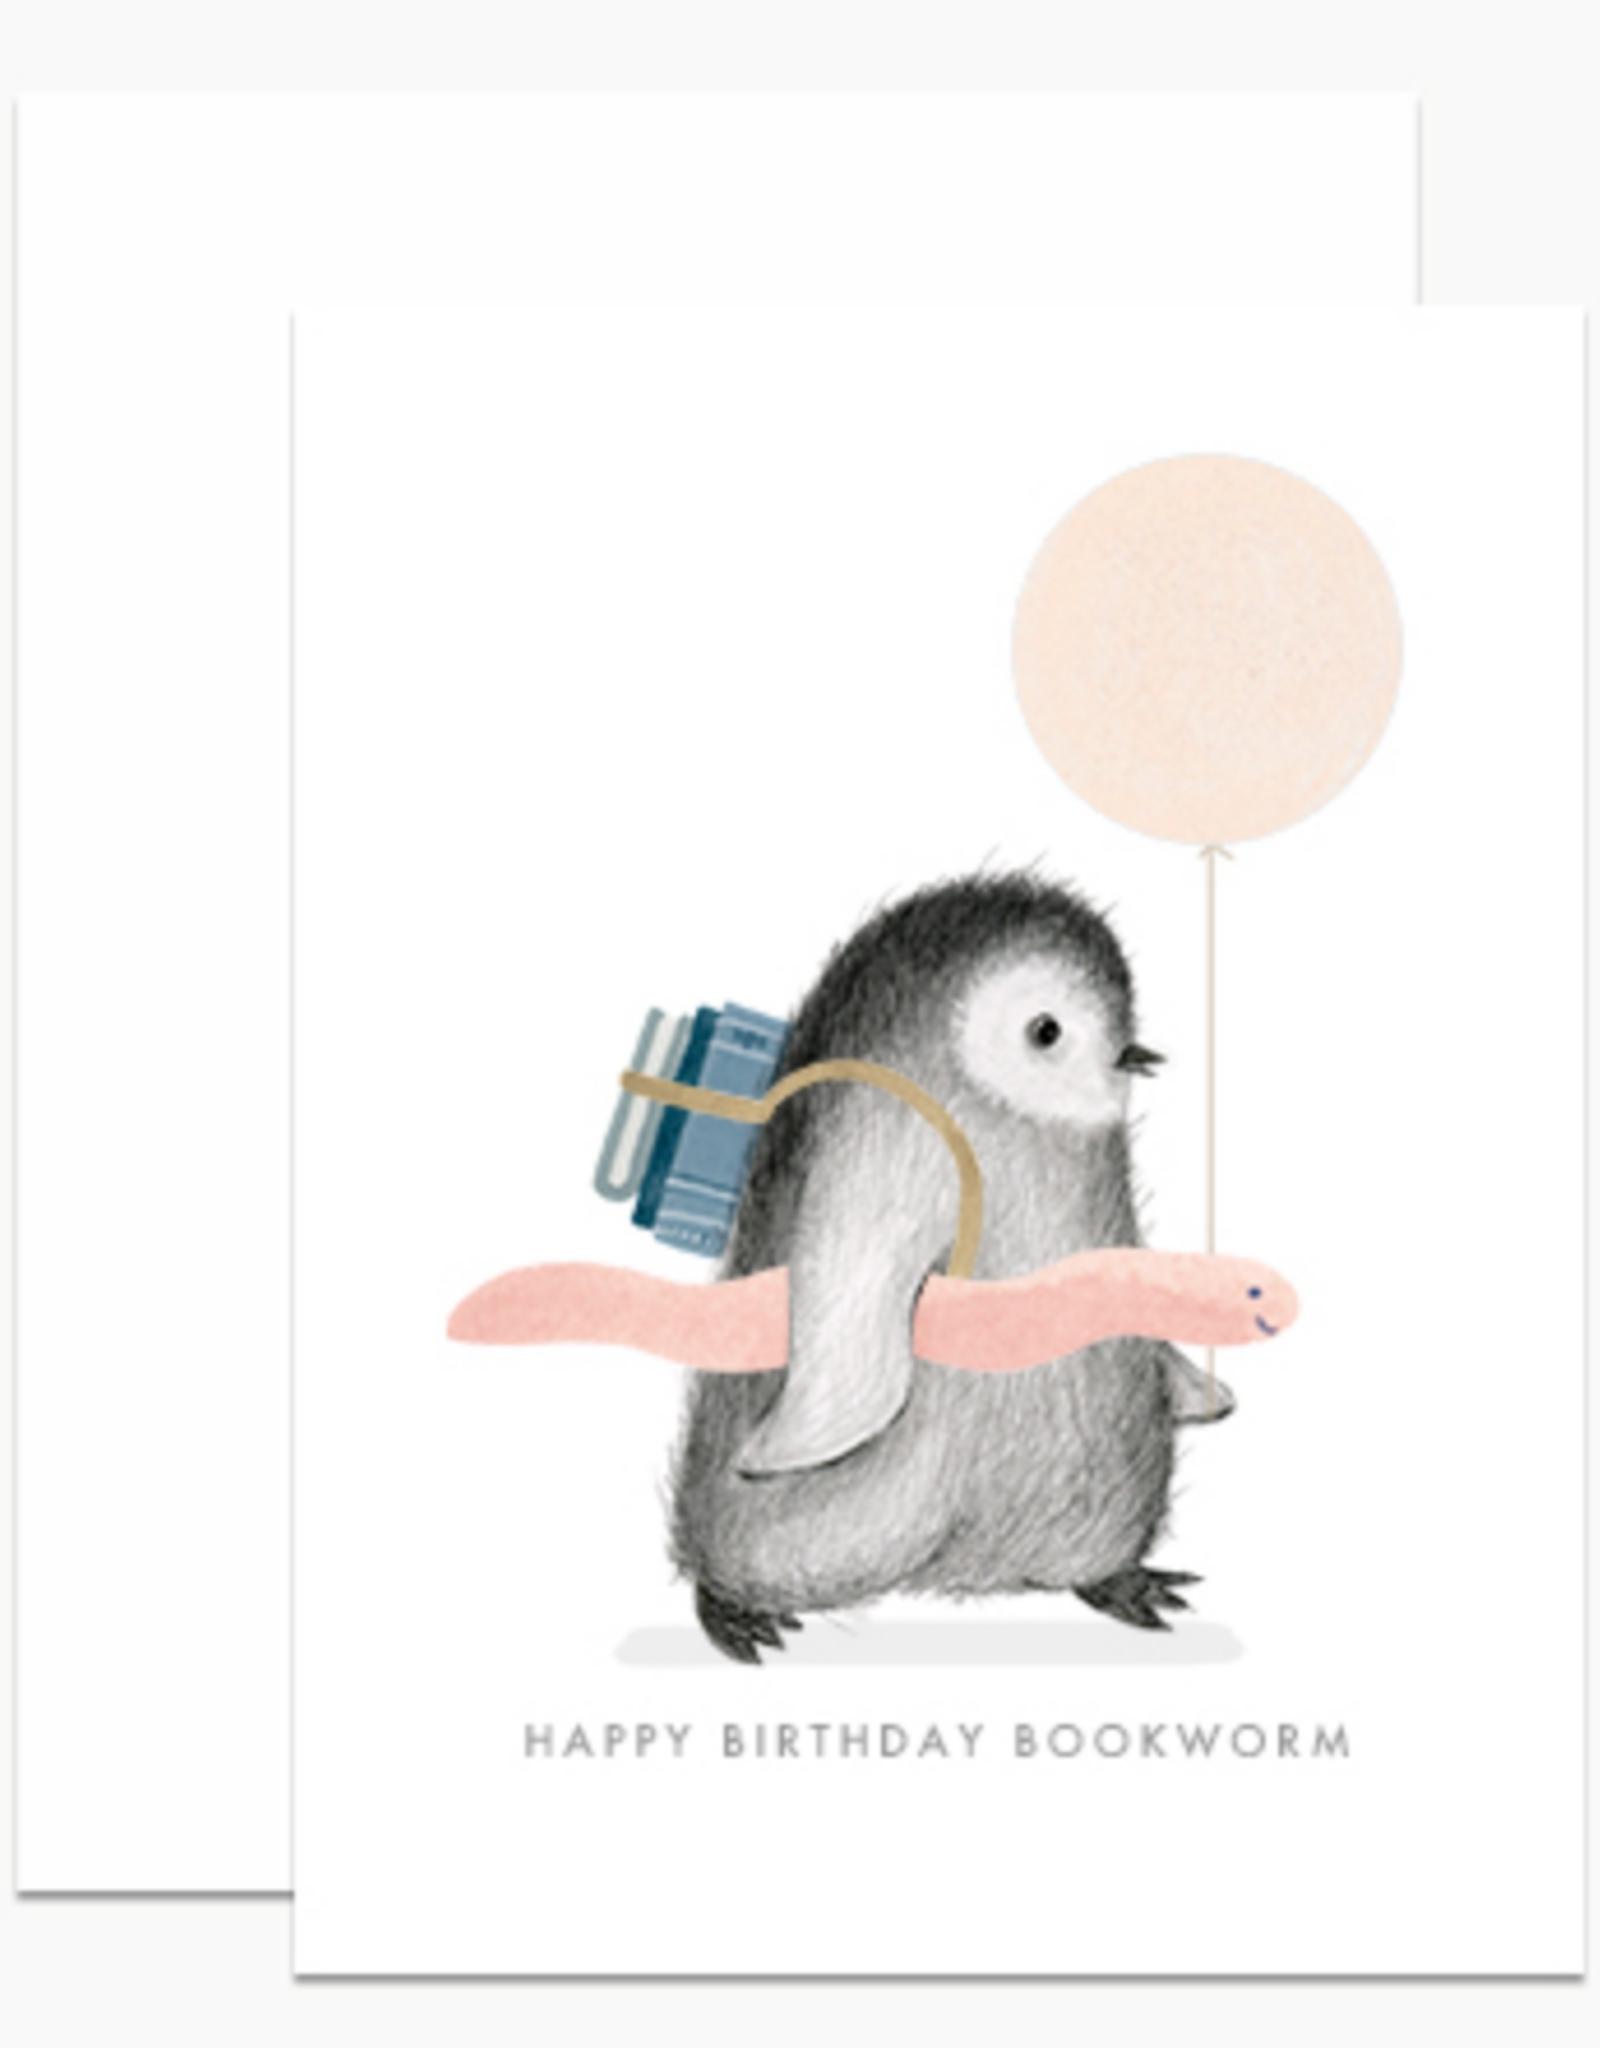 Happy Birthday Bookworm (Penguin) Greeting Card